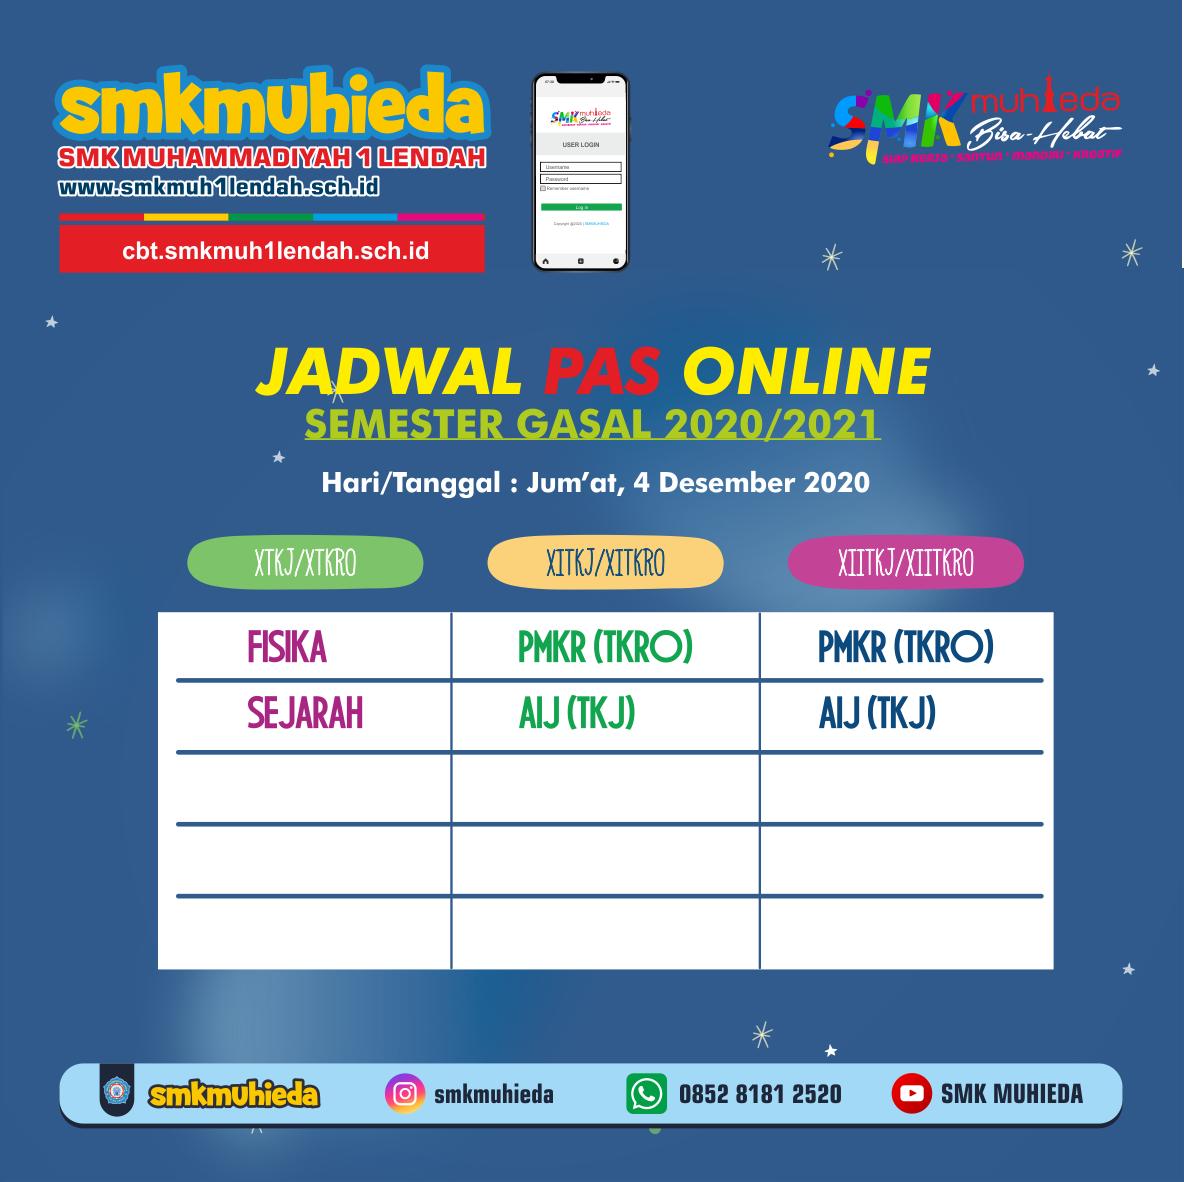 Jadwal PAS Semester Gasal 4/12/2020